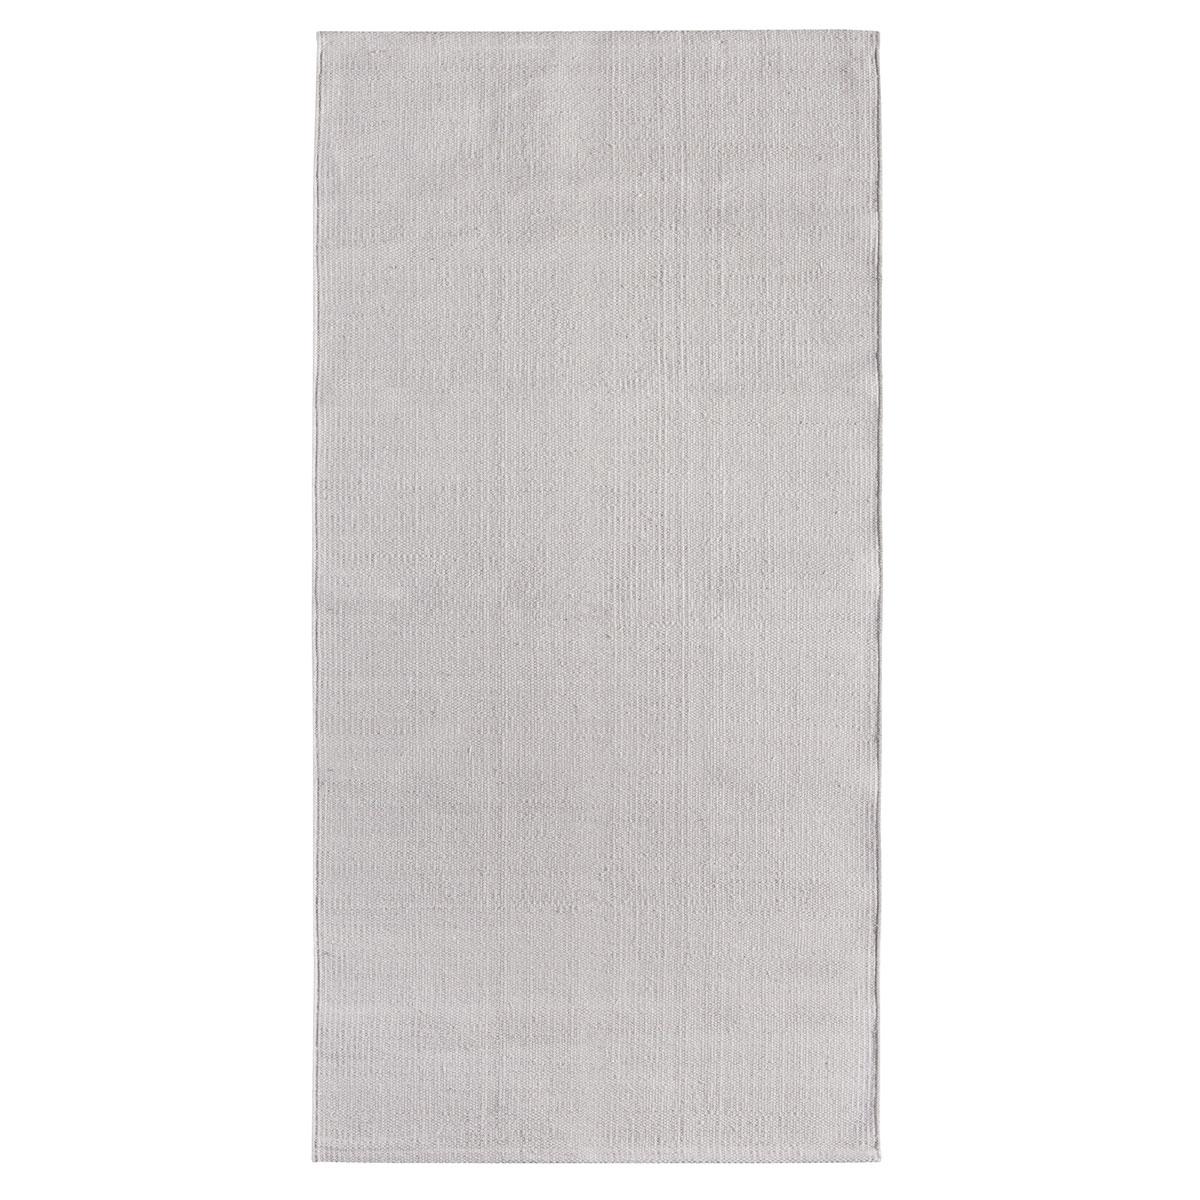 "Teppich ""Missouri"" 60x120 cm, grau grau"